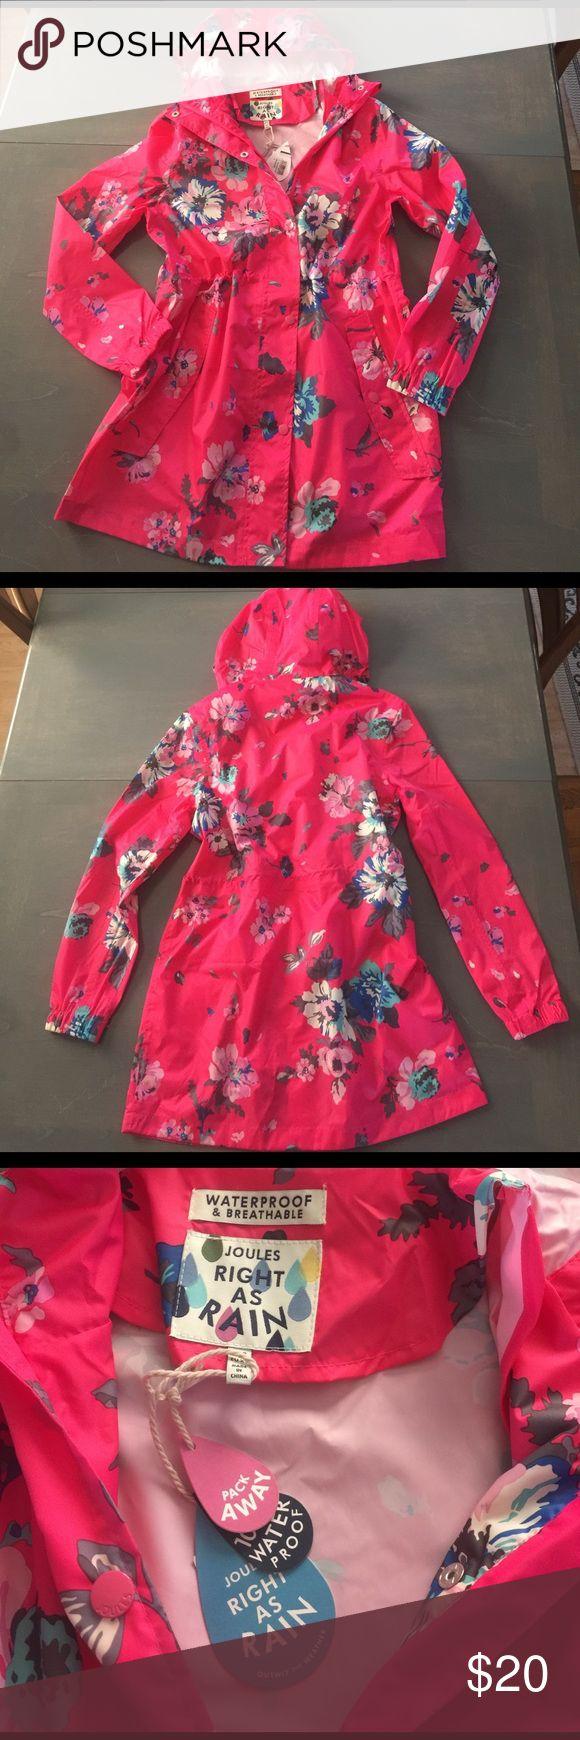 "Joules - Right as Rain - SZ 4 Rain Coat ☂️ BNWT - Joules ""Right as Rain"" ☔️ Raincoat in a darling pink floral pattern, size 4. Joules Jackets & Coats"